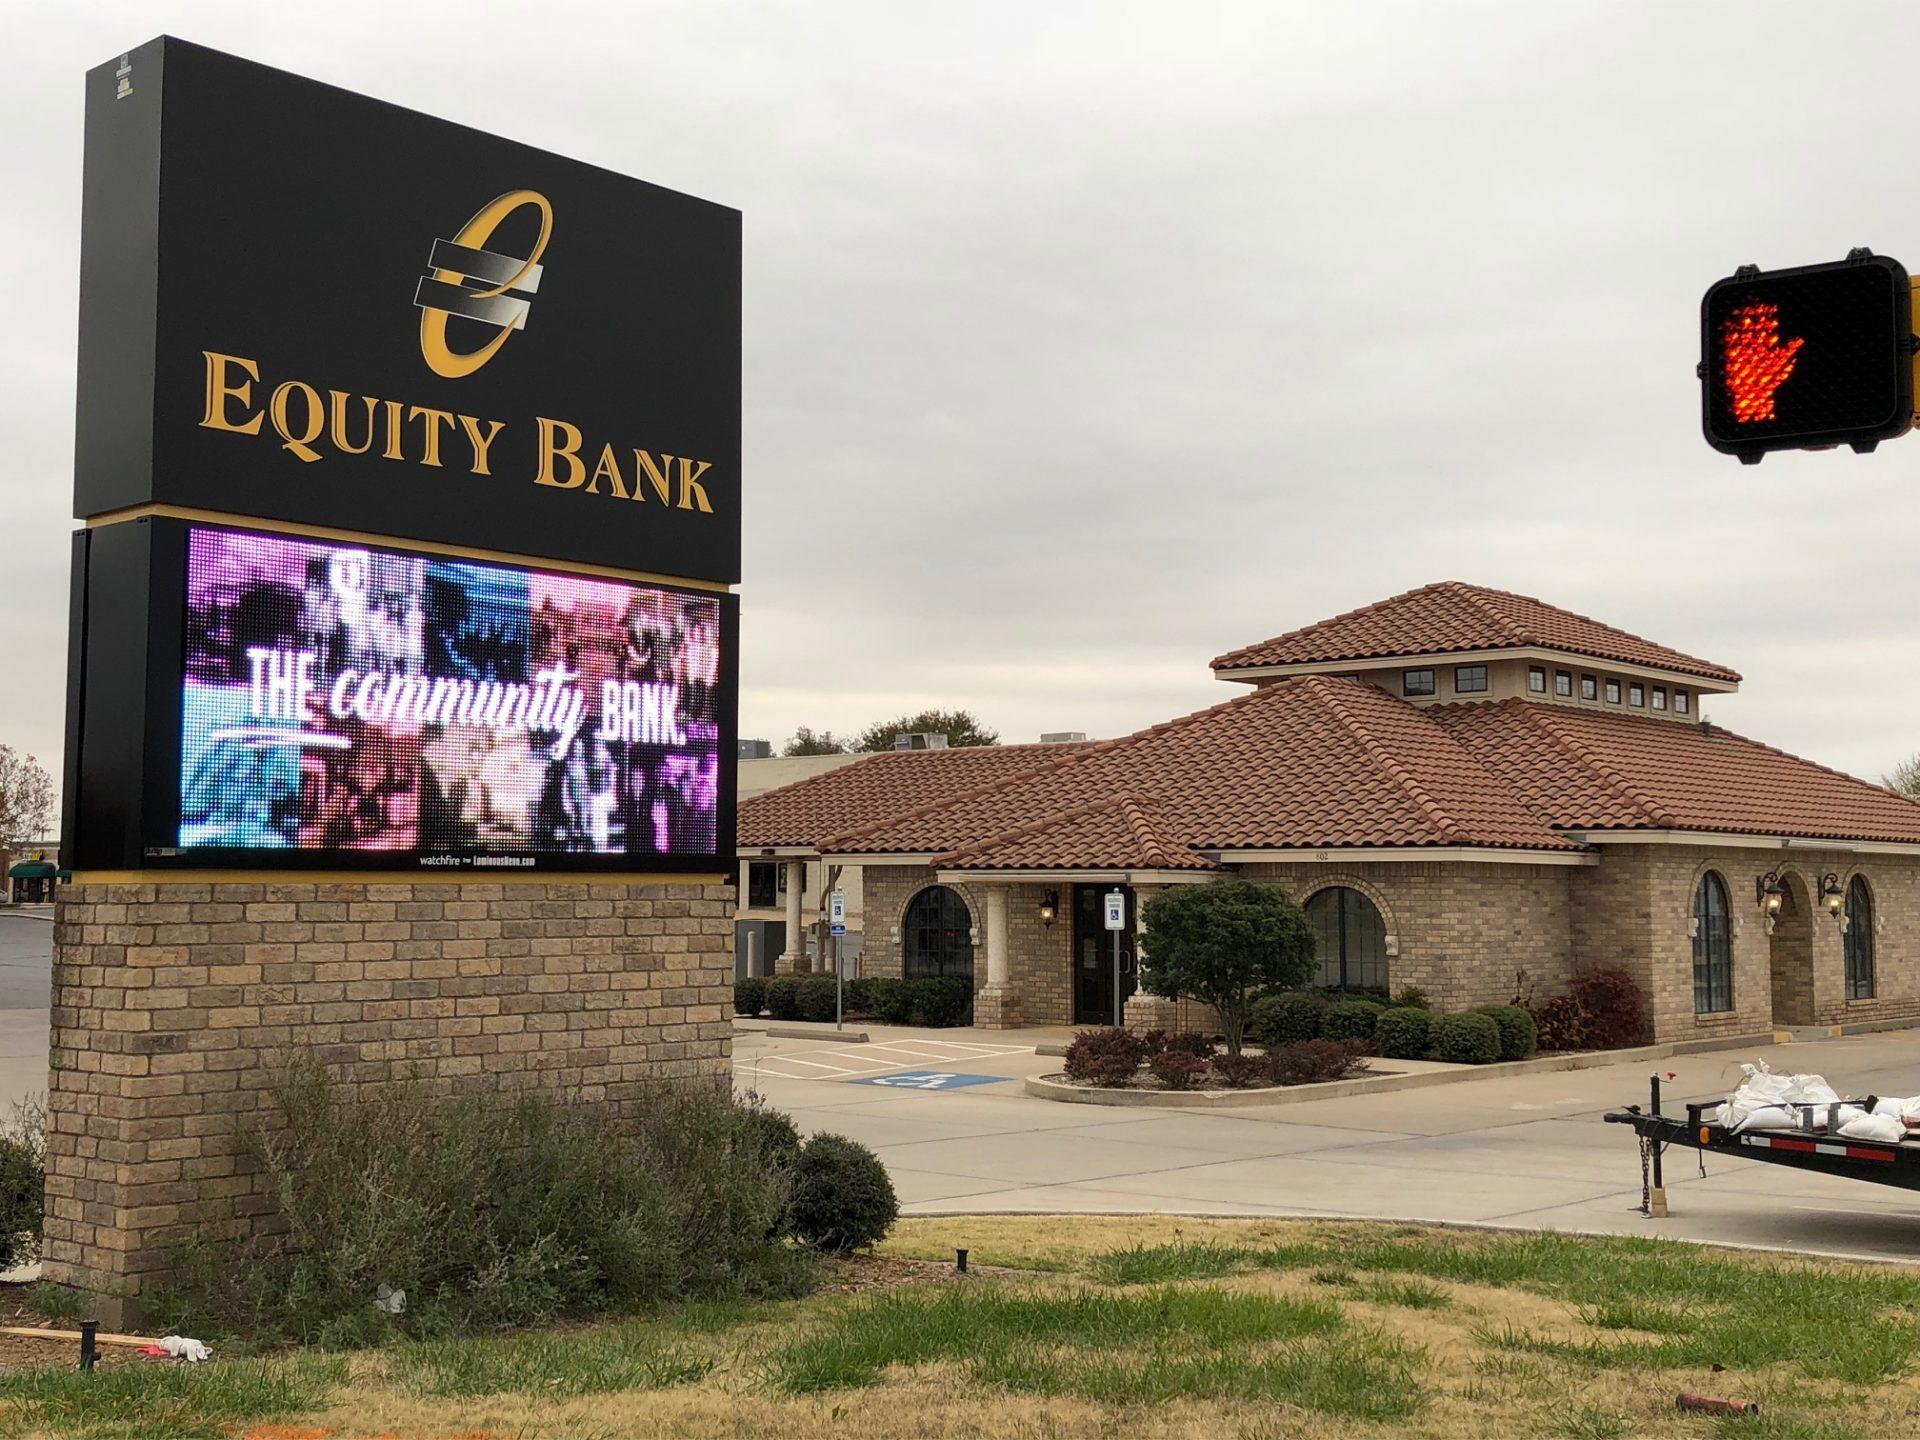 Equity Bank Ponca City North Park branch exterior.